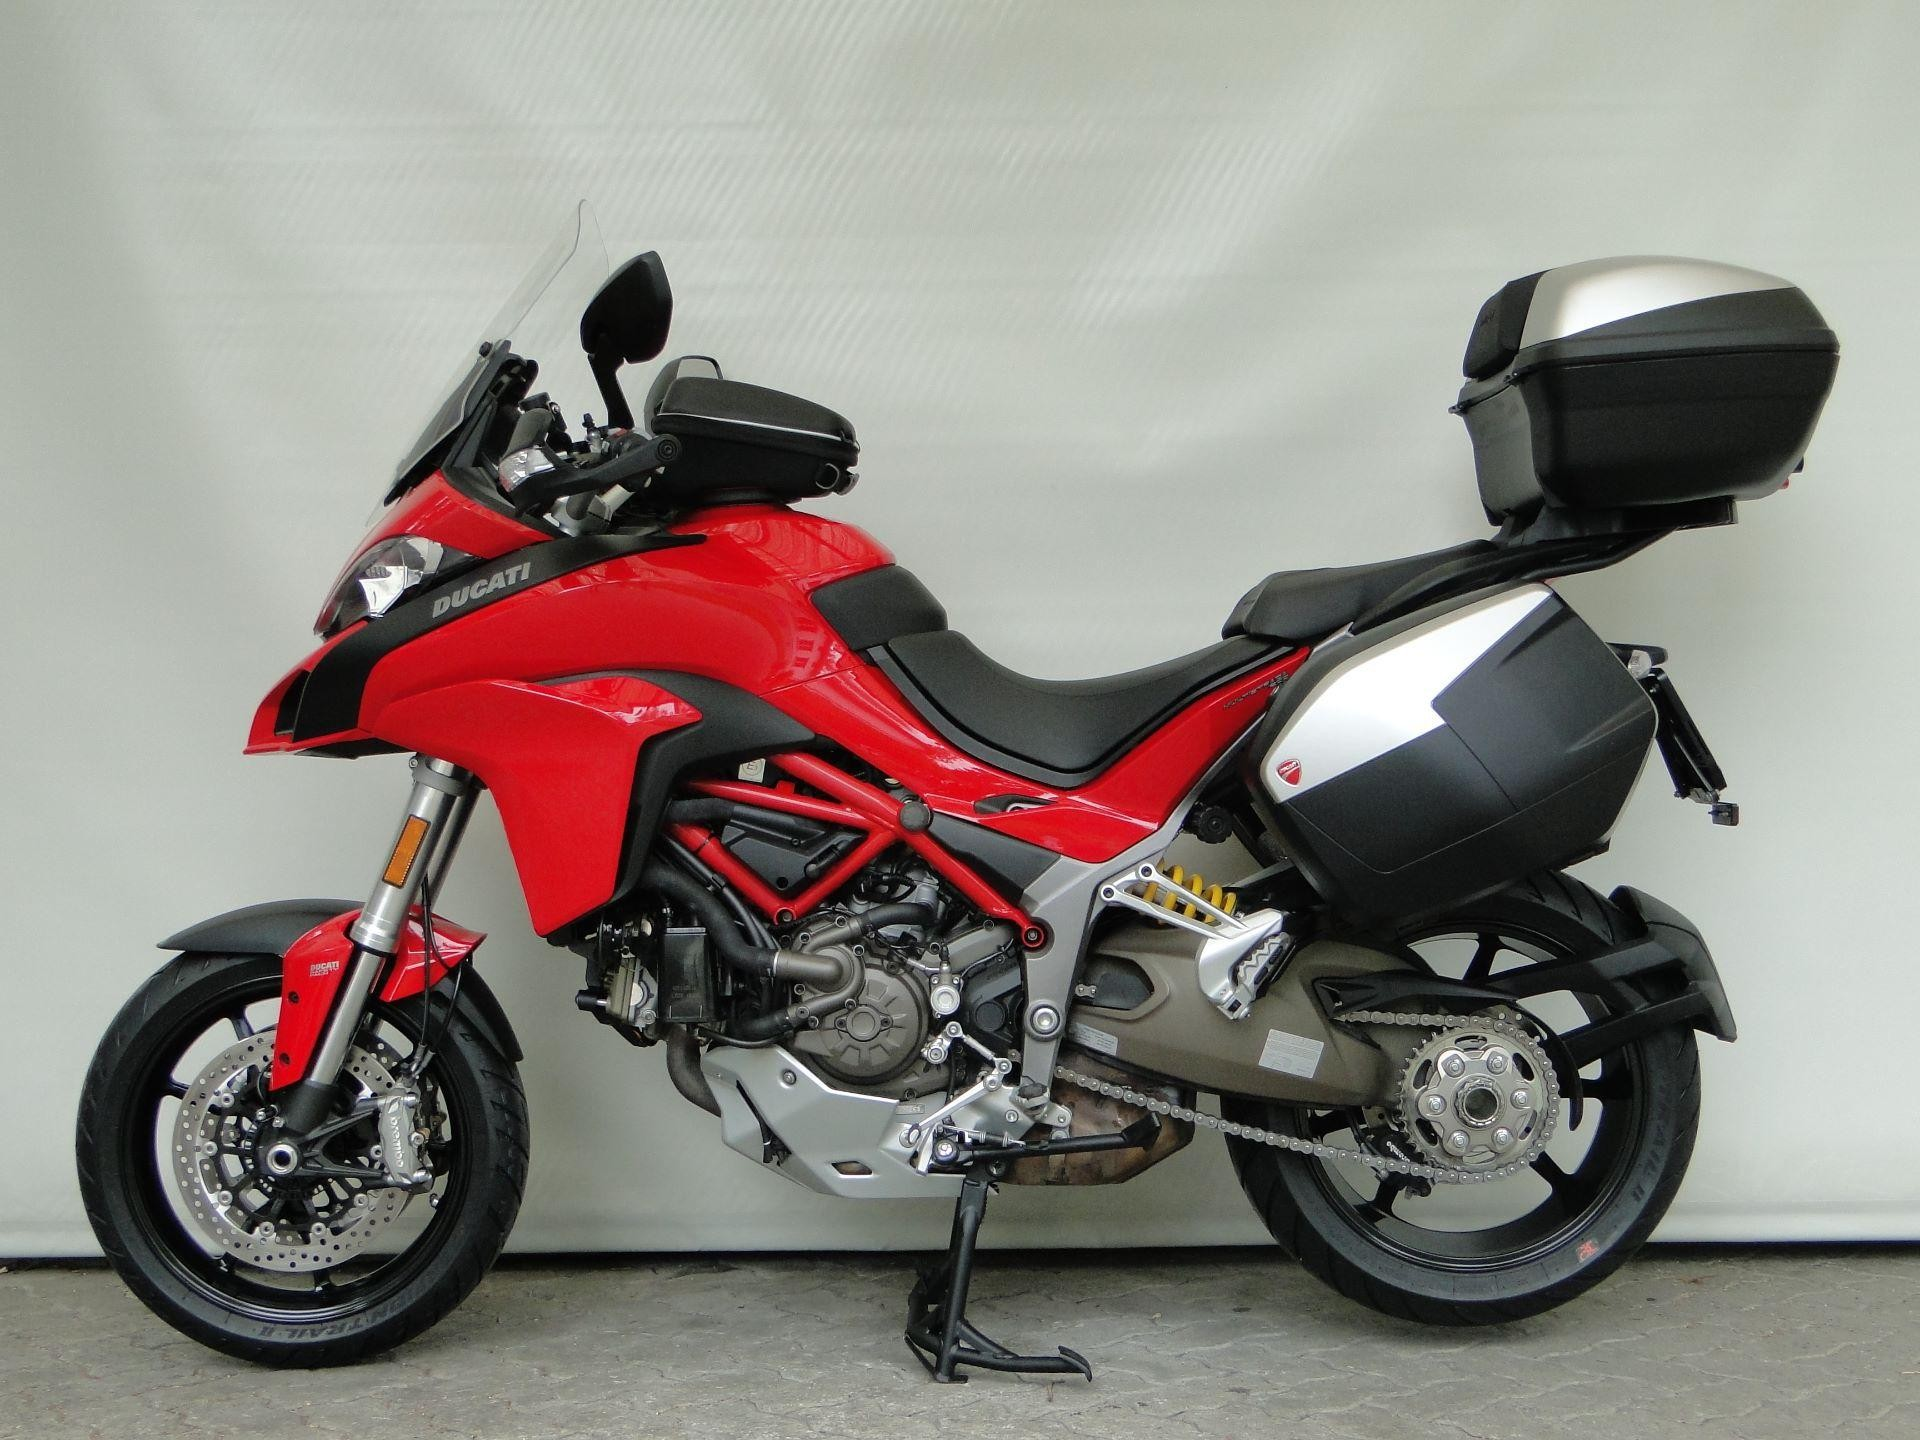 motorrad occasion kaufen ducati 1200 multistrada abs s touring pack hobi moto ag winterthur. Black Bedroom Furniture Sets. Home Design Ideas